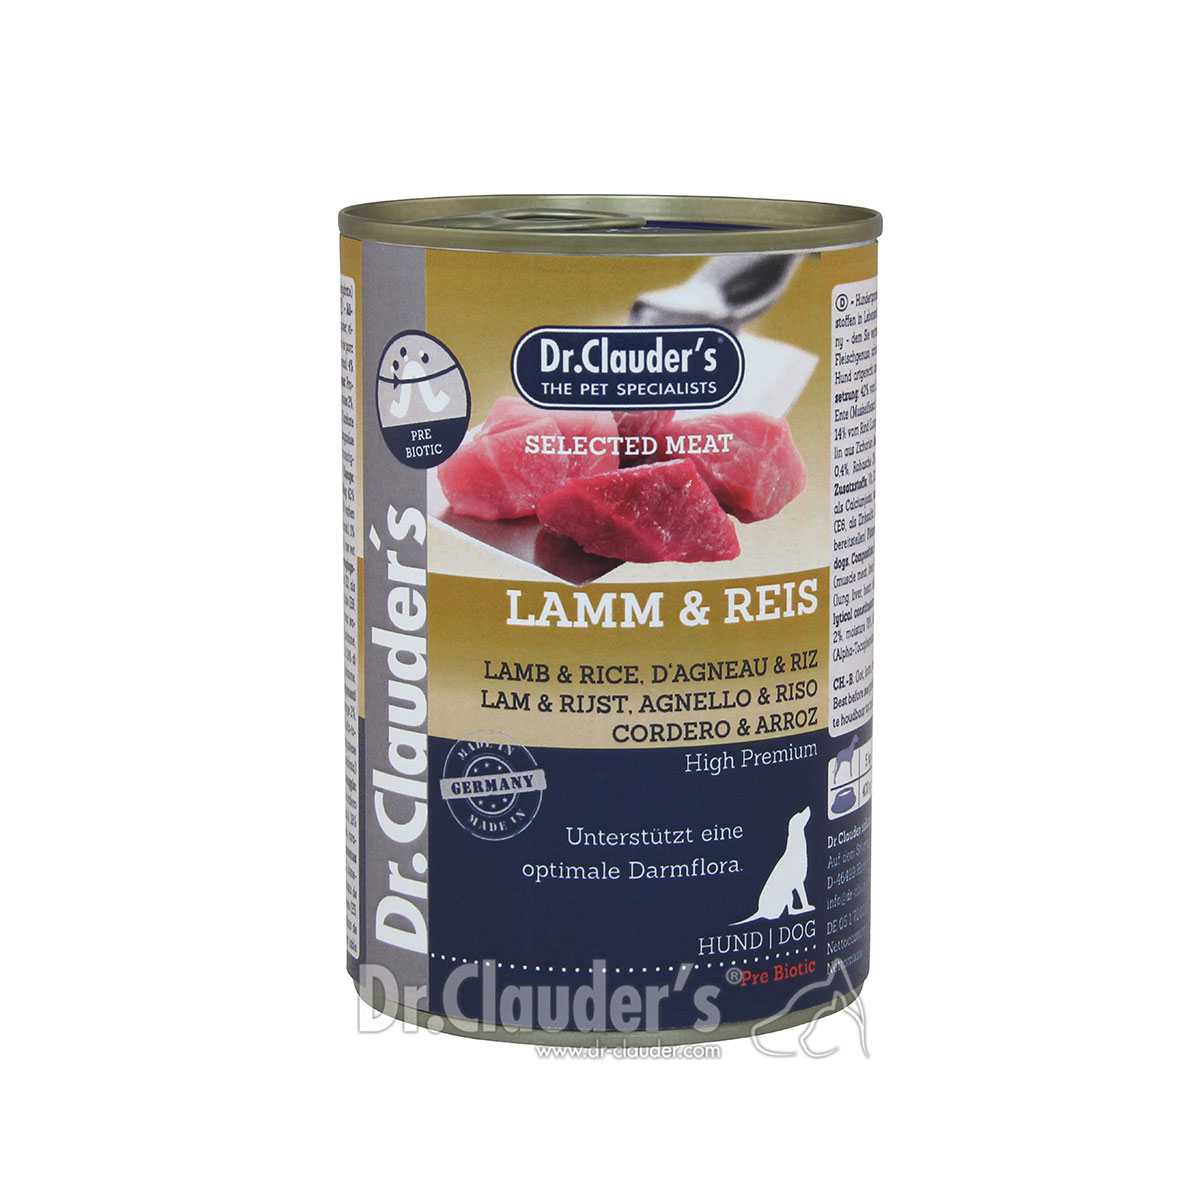 dr clauders selected meat prebiotics 6x400g kaufen bei. Black Bedroom Furniture Sets. Home Design Ideas